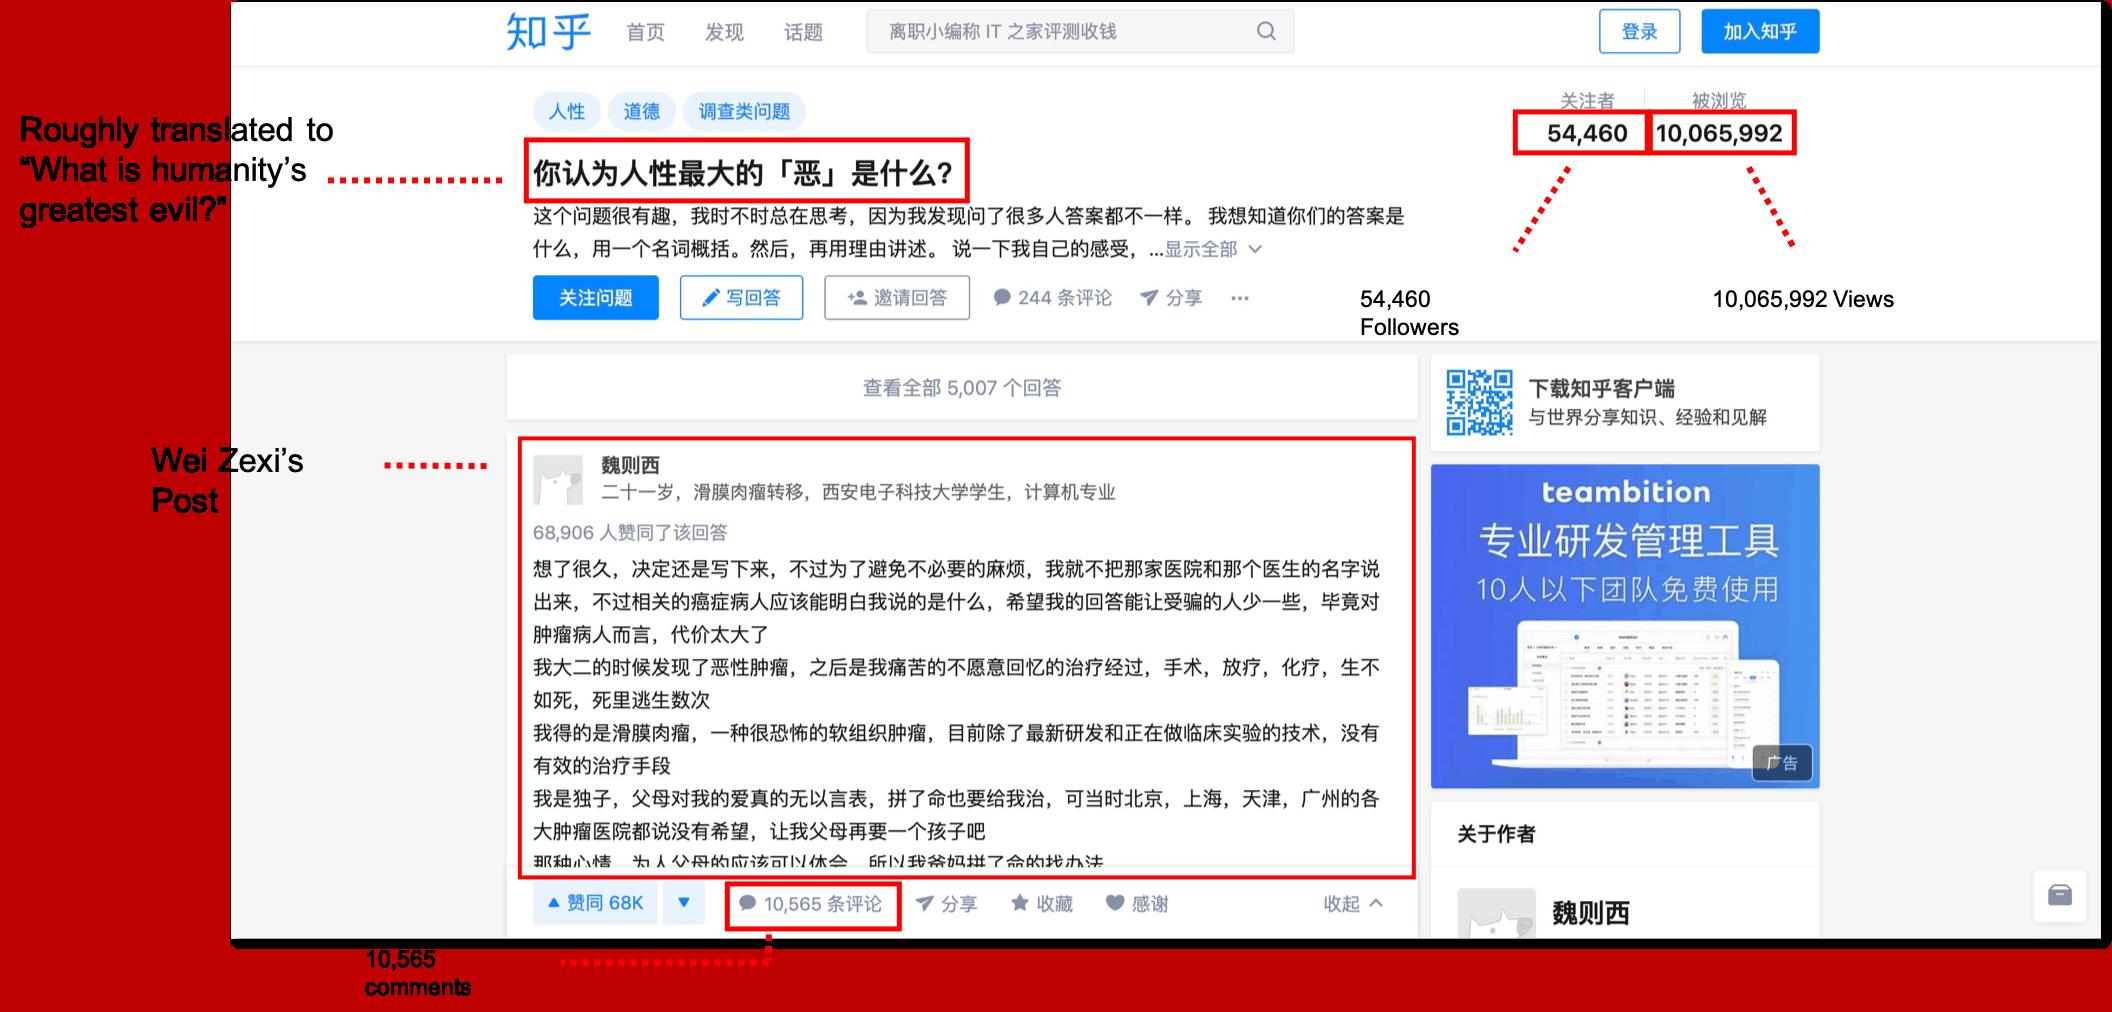 Wei Zexi's Post, Still Live on Zhihu